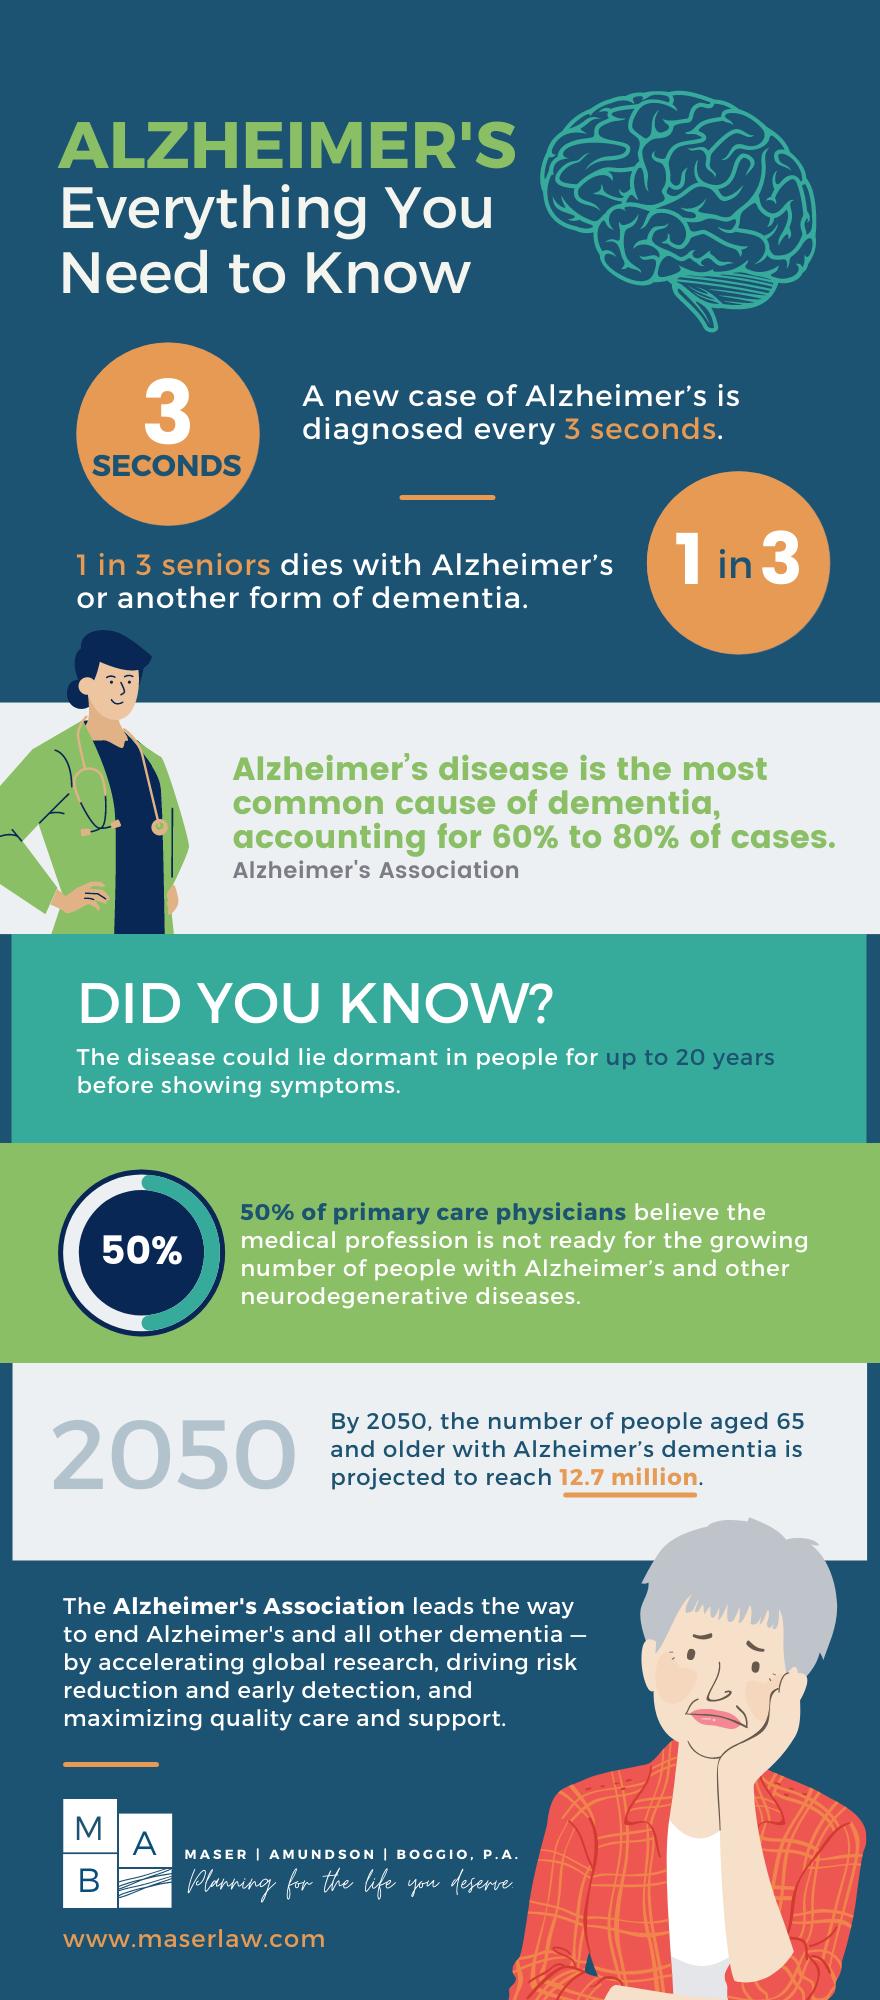 MAB - Dementia Infographic (2)